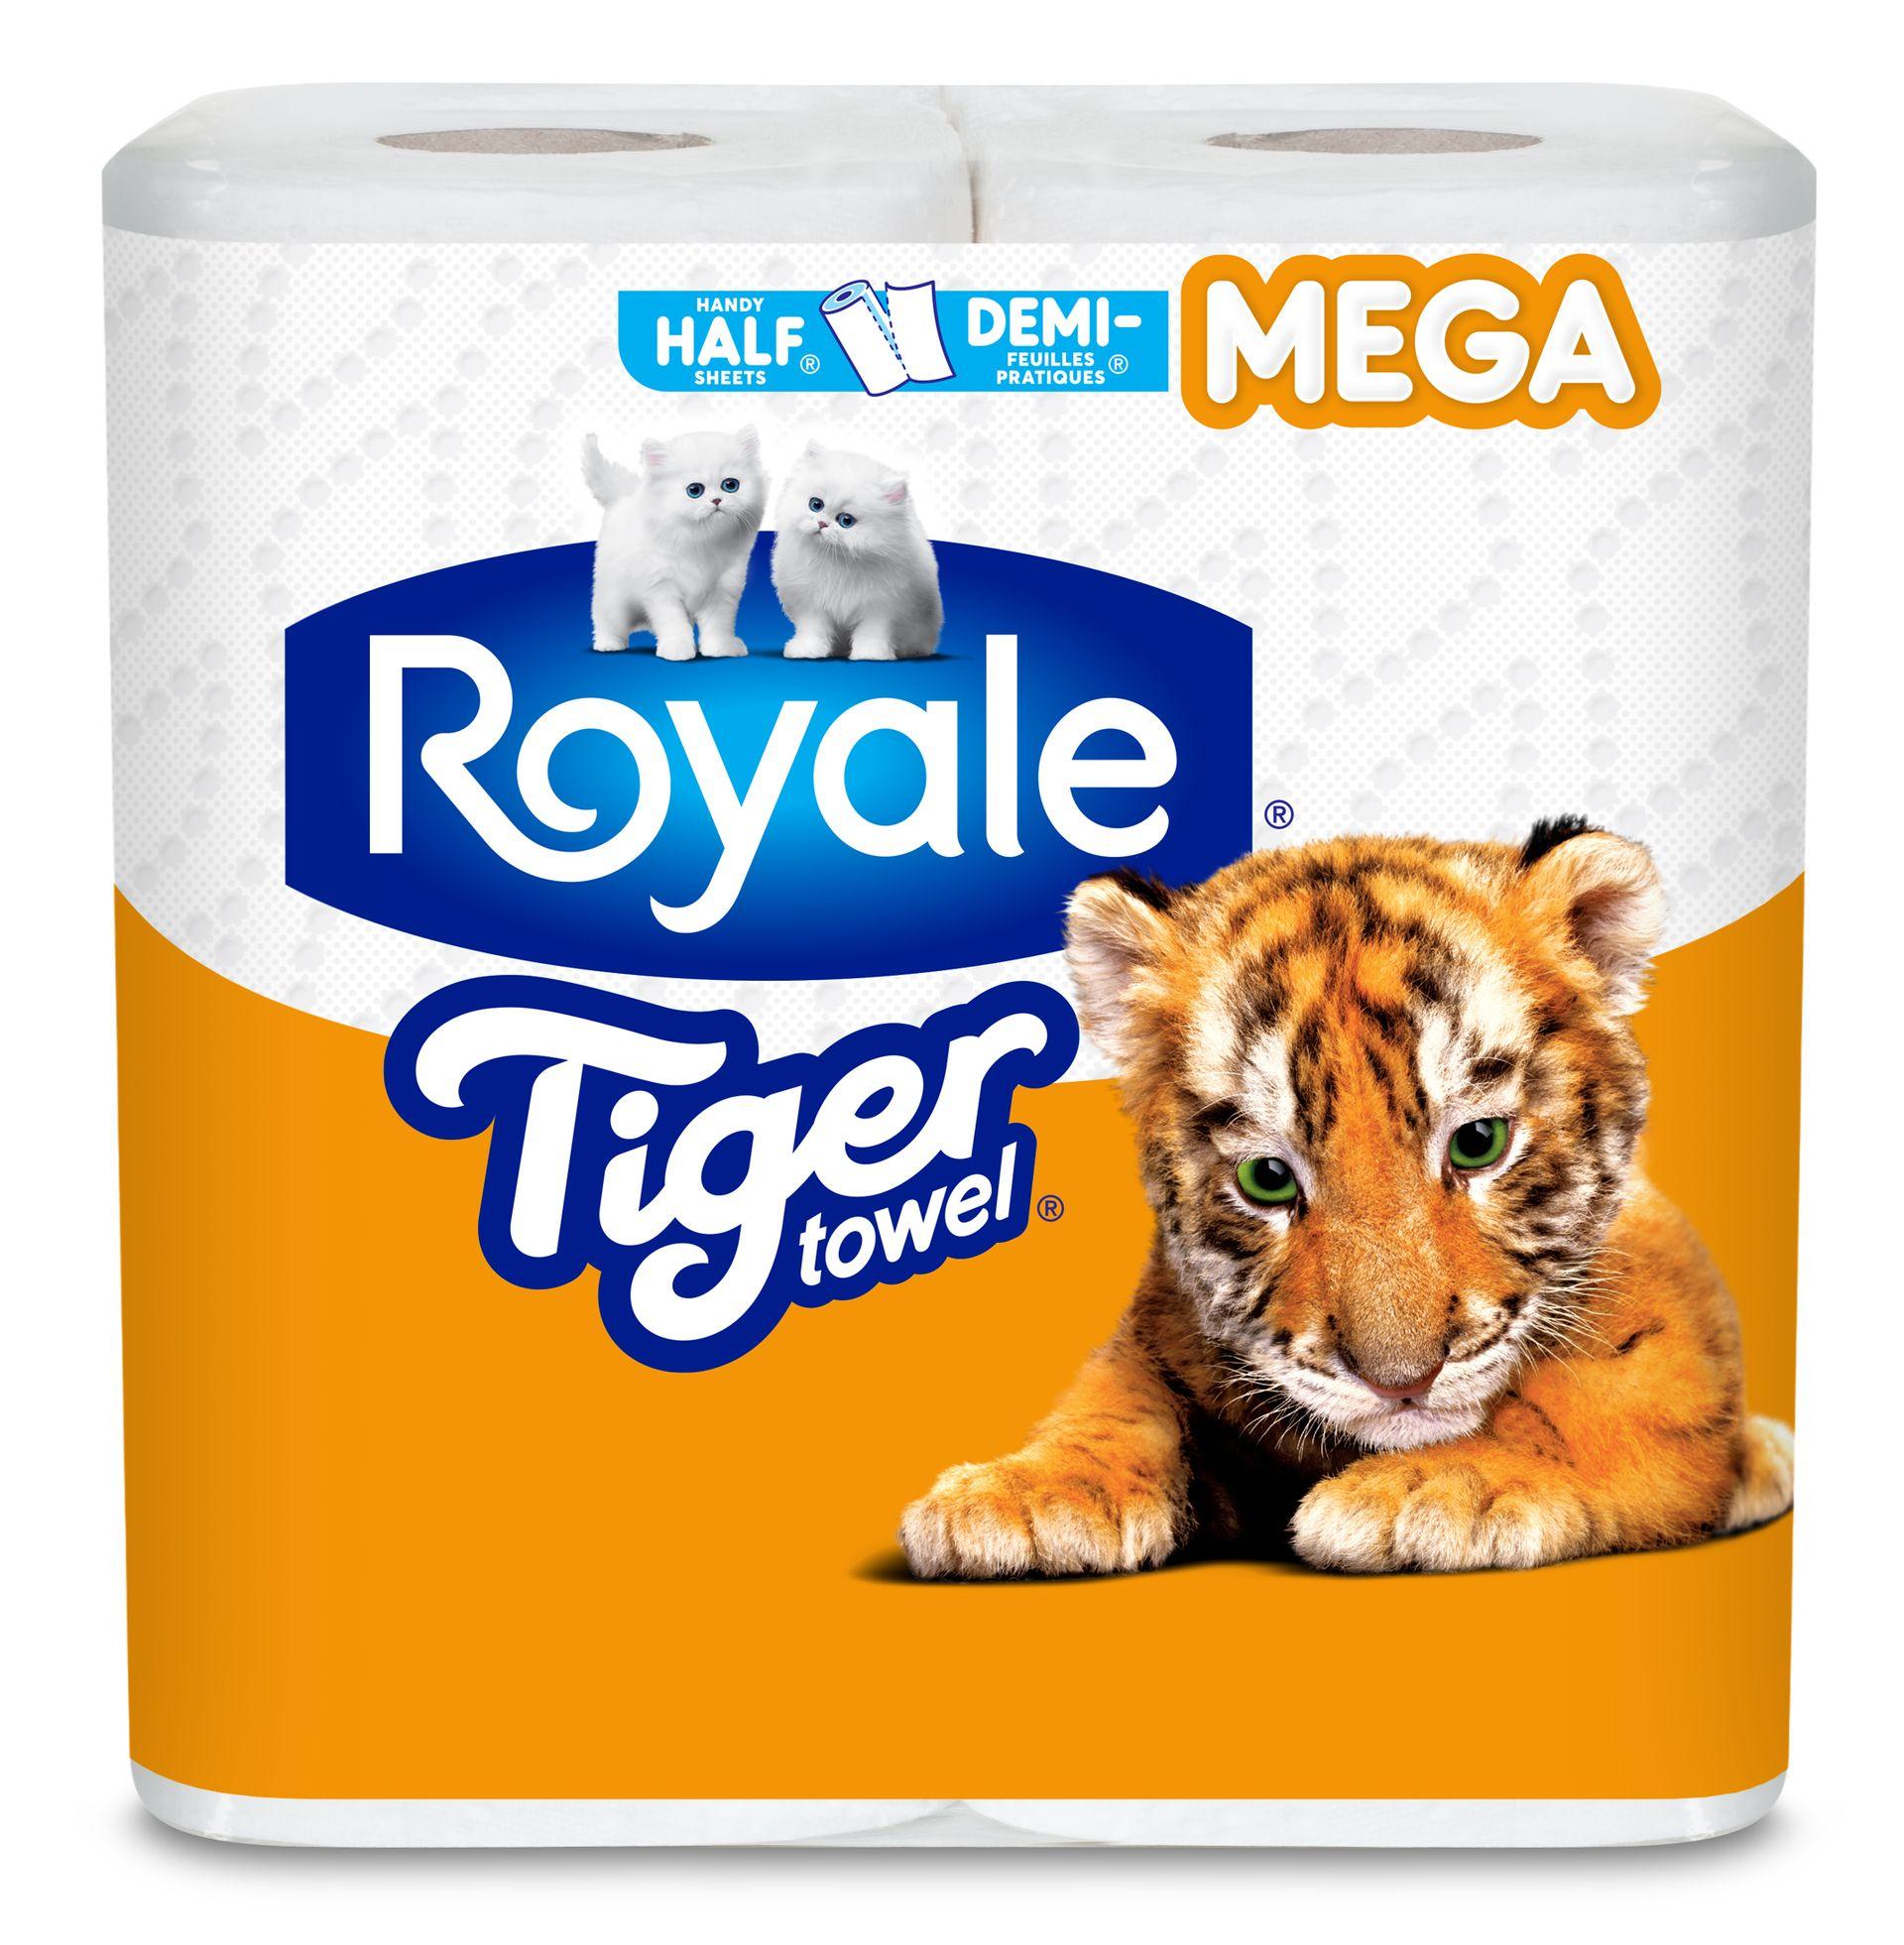 ROYALEMD Tiger TowelMD en Demi-feuilles pratiquesMD, rouleaux mega pack